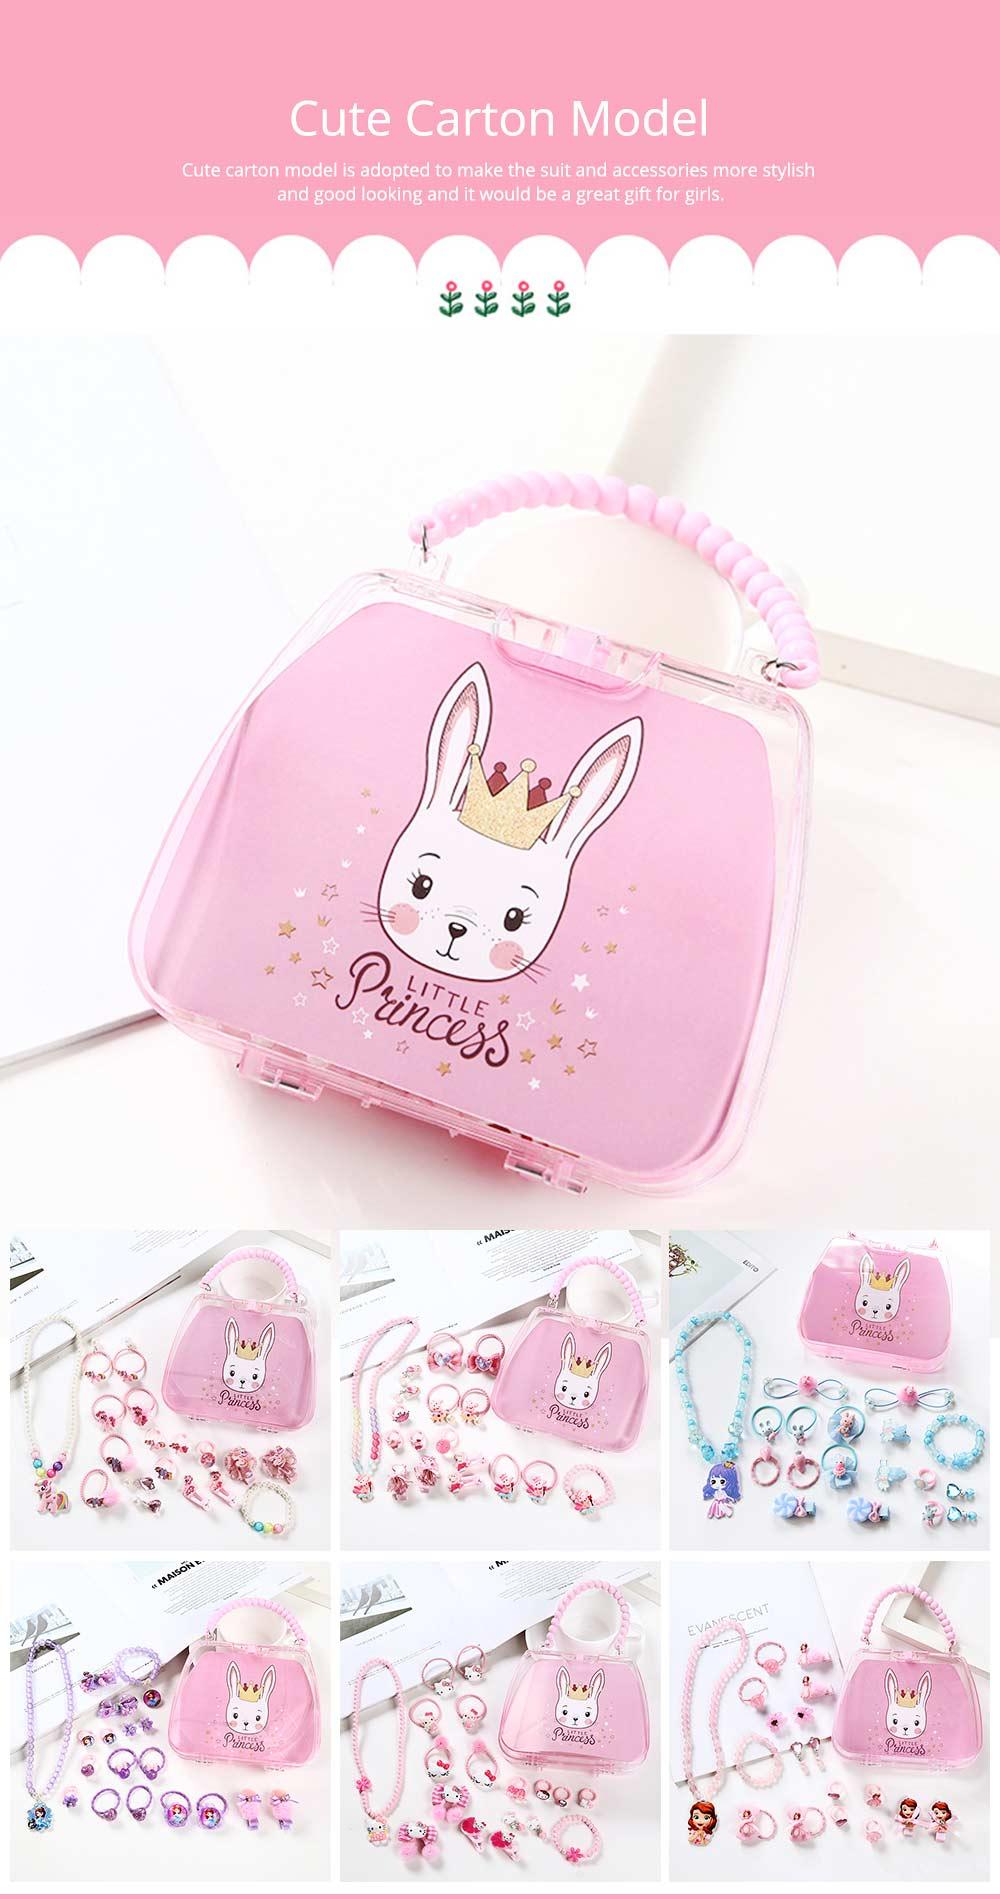 Creative Elegant Hair Accessories Necklace Bracelet Rings Suit, Cute Carton Decoration Acrylic Hand Bag Box Present for Girls 8